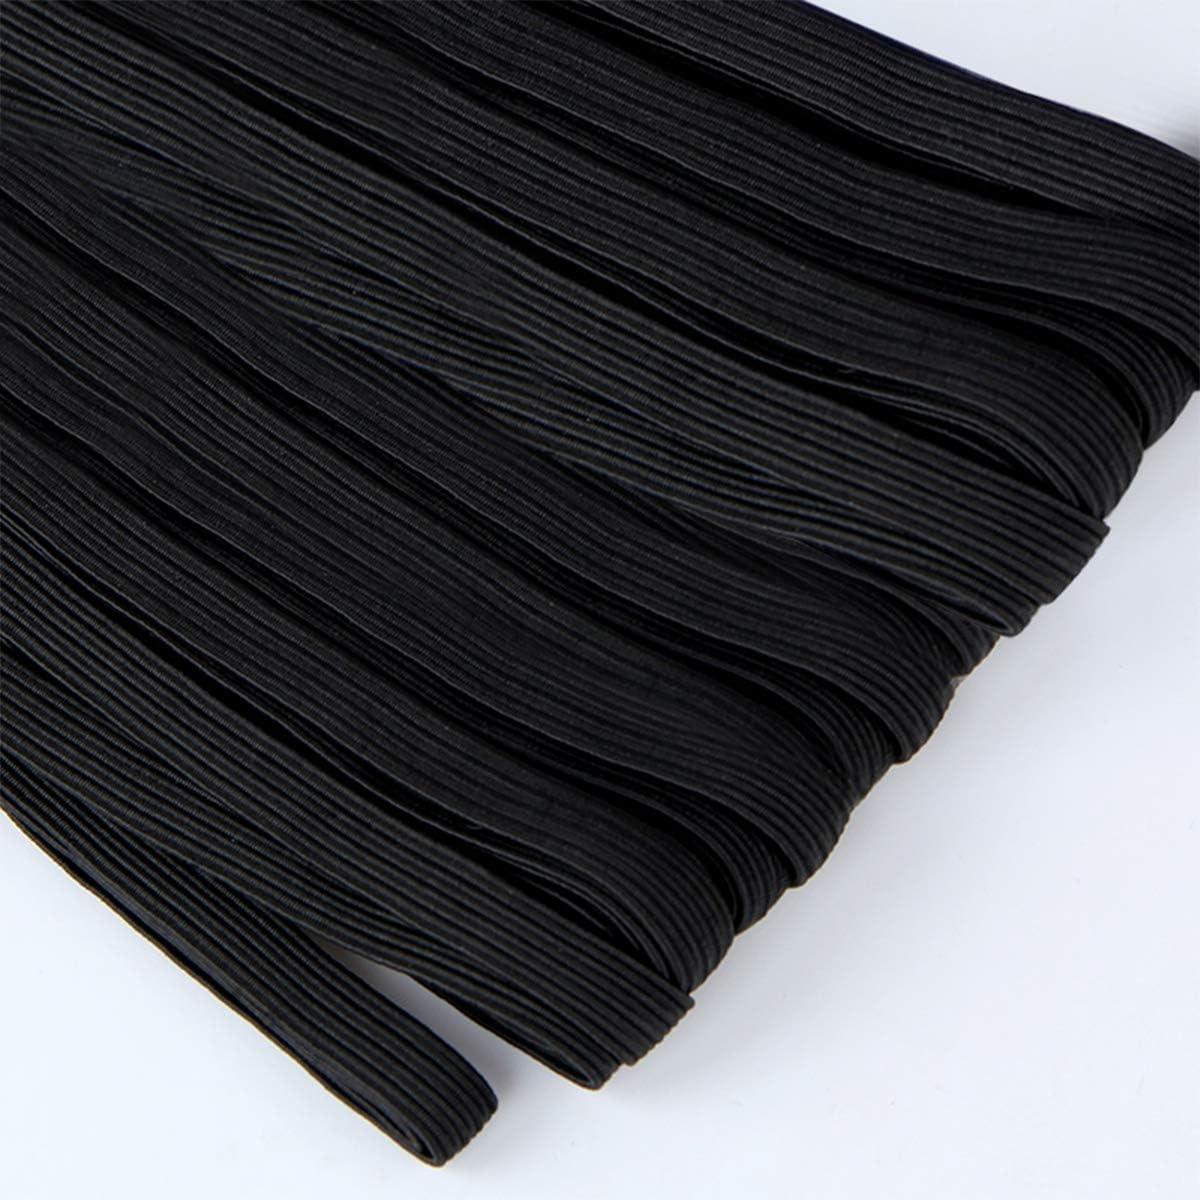 Flat Elastic Band Heavy Stretch High Elasticity Knit Elastic Band for Sewing Crafting Black, 200 Yards 3mm